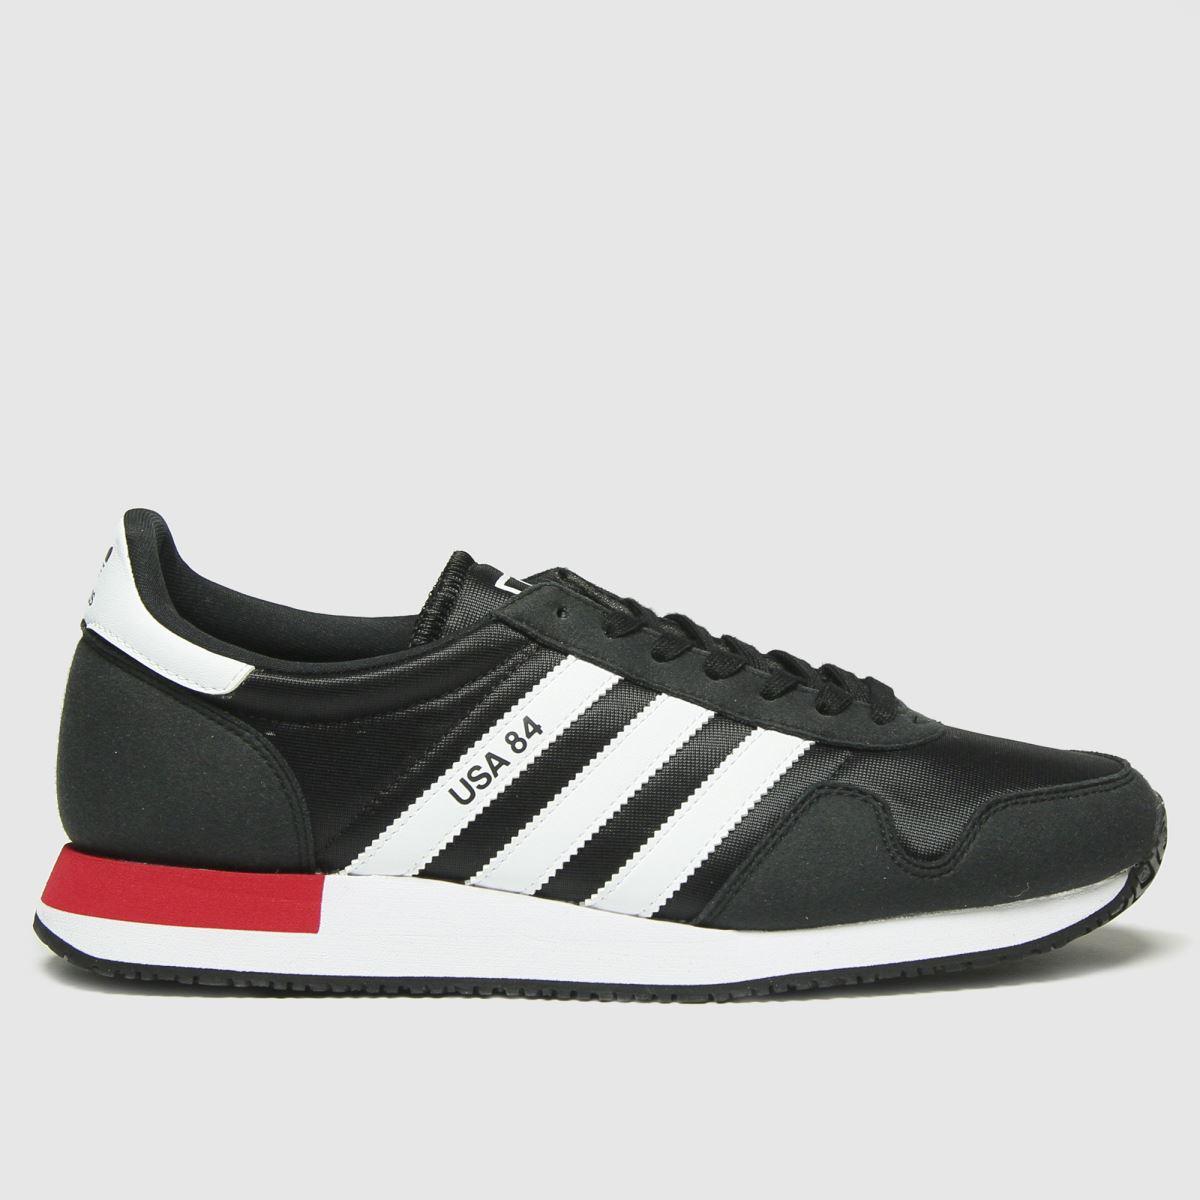 Adidas Black Adi Usa 84 Trainers